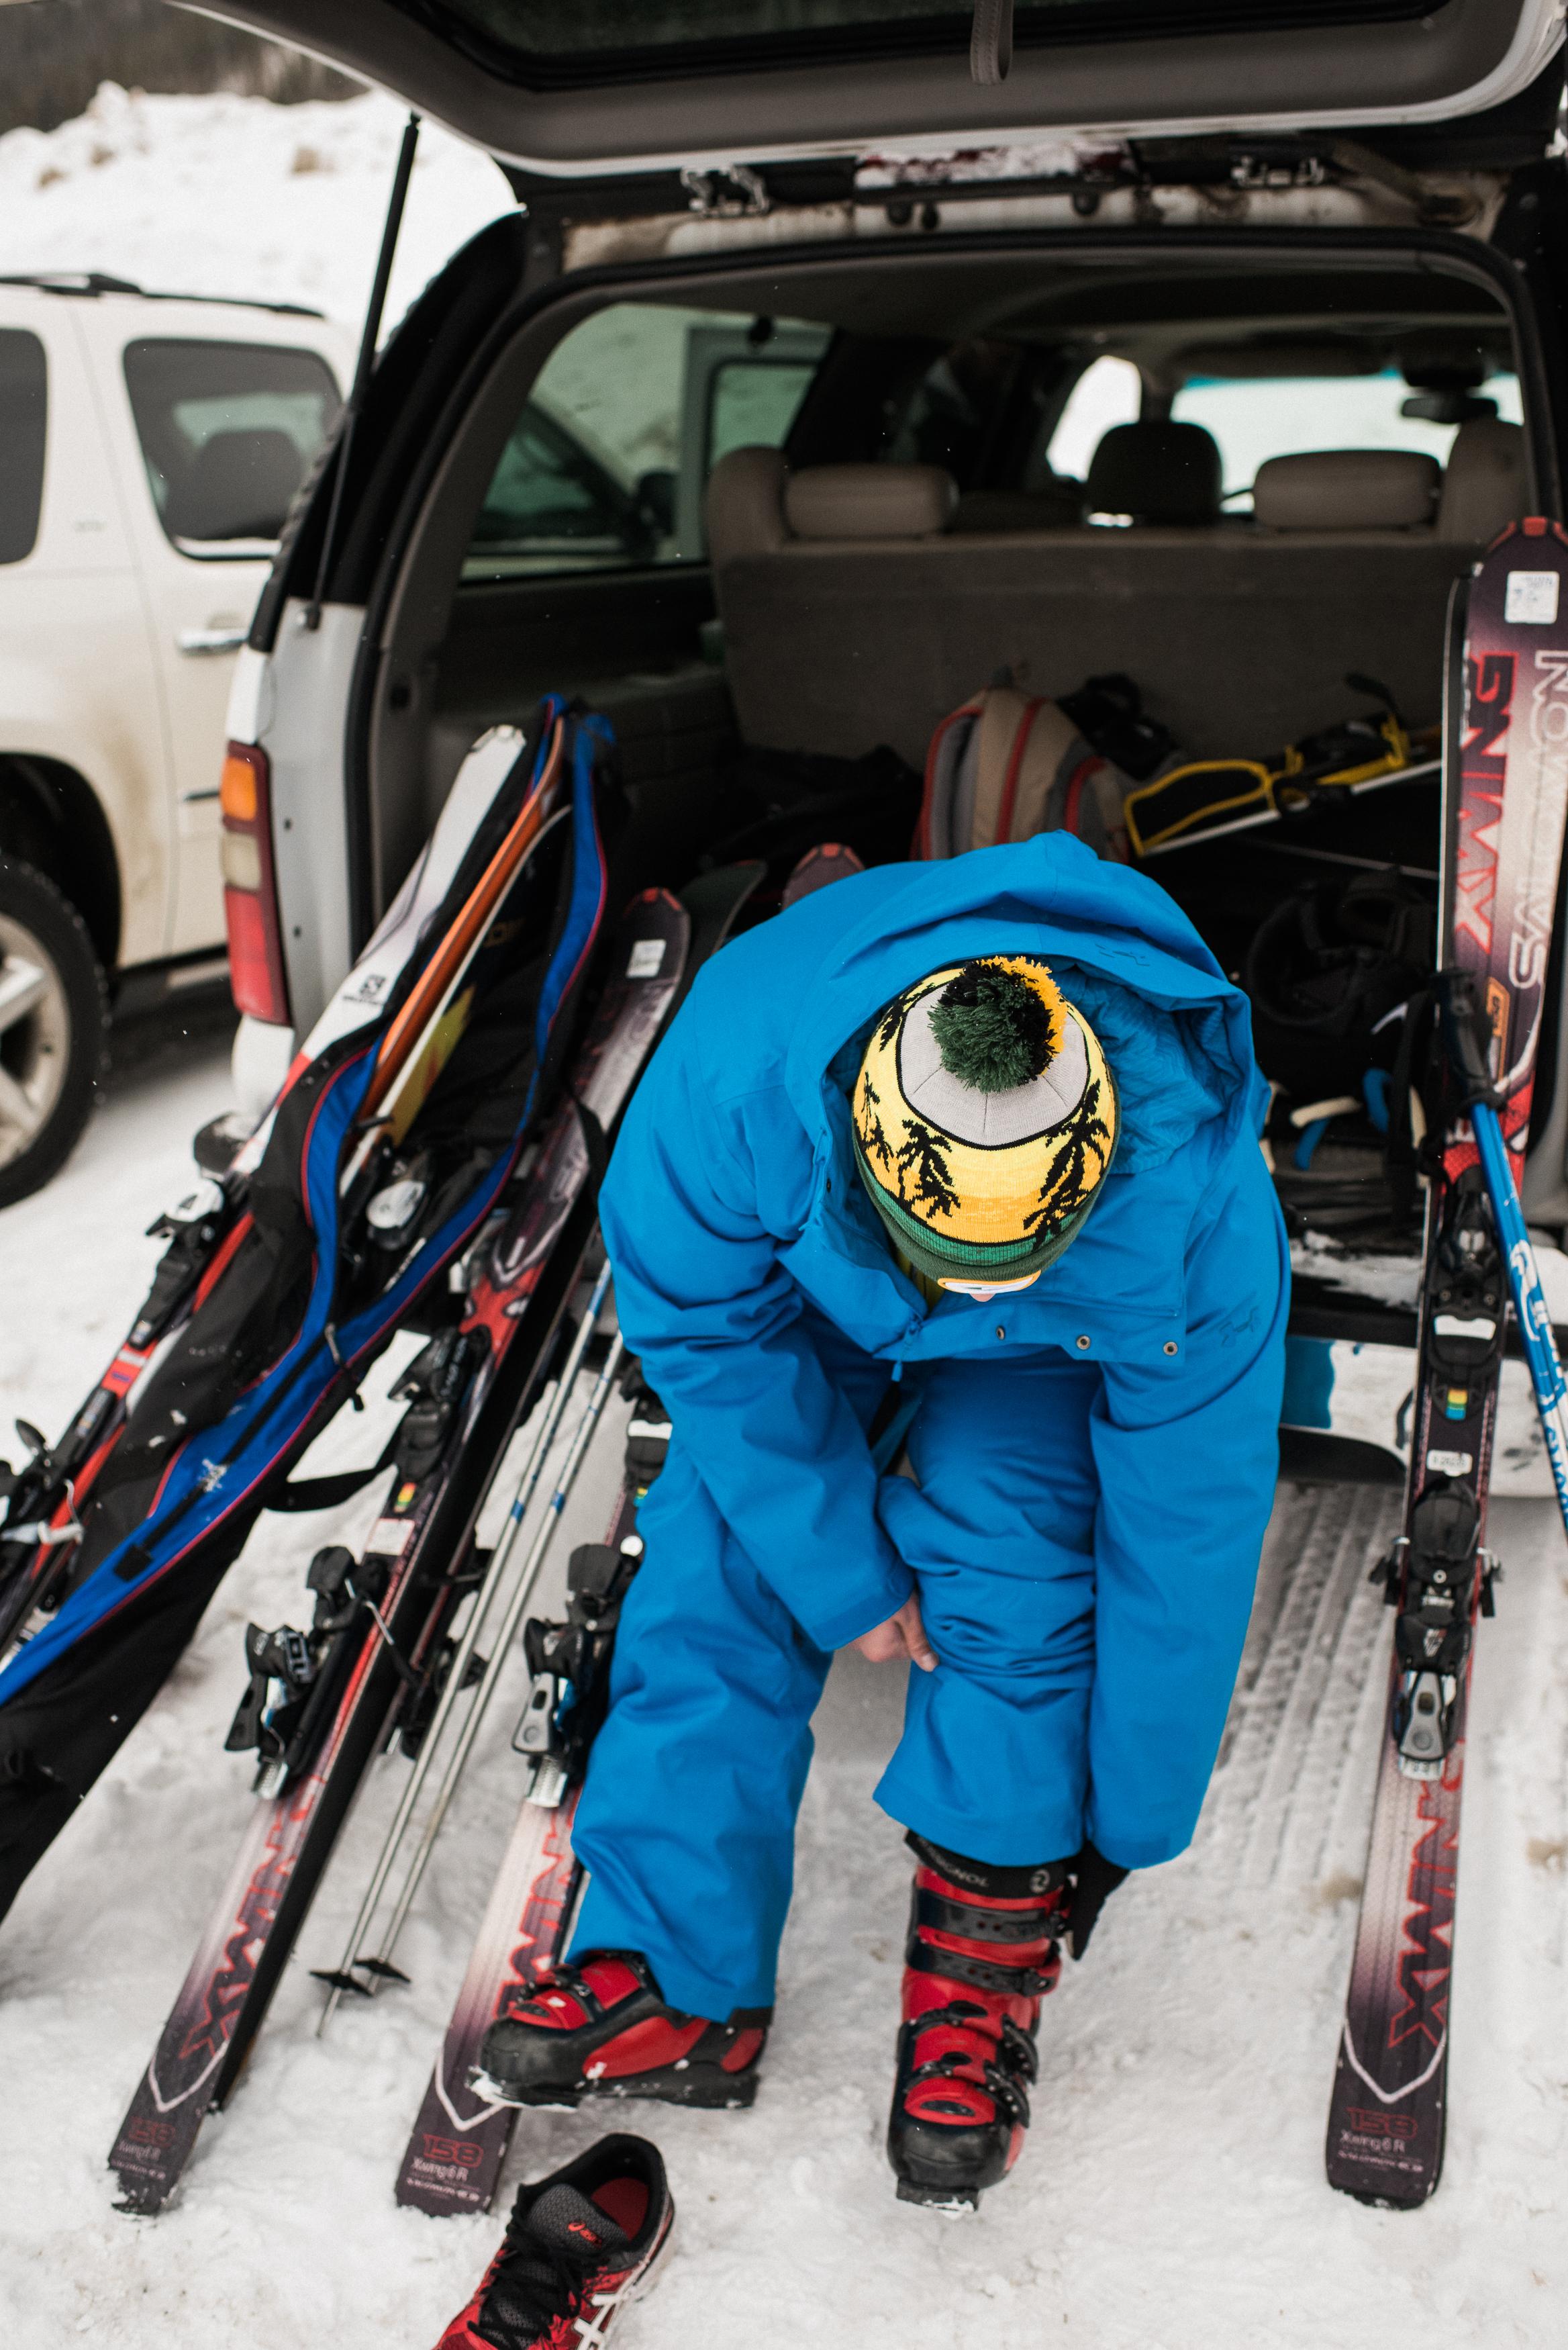 TaraShupe_Outdoor_Photographer_Loweprobags_Colorado_Copper_Mountains_Ski_04.jpg